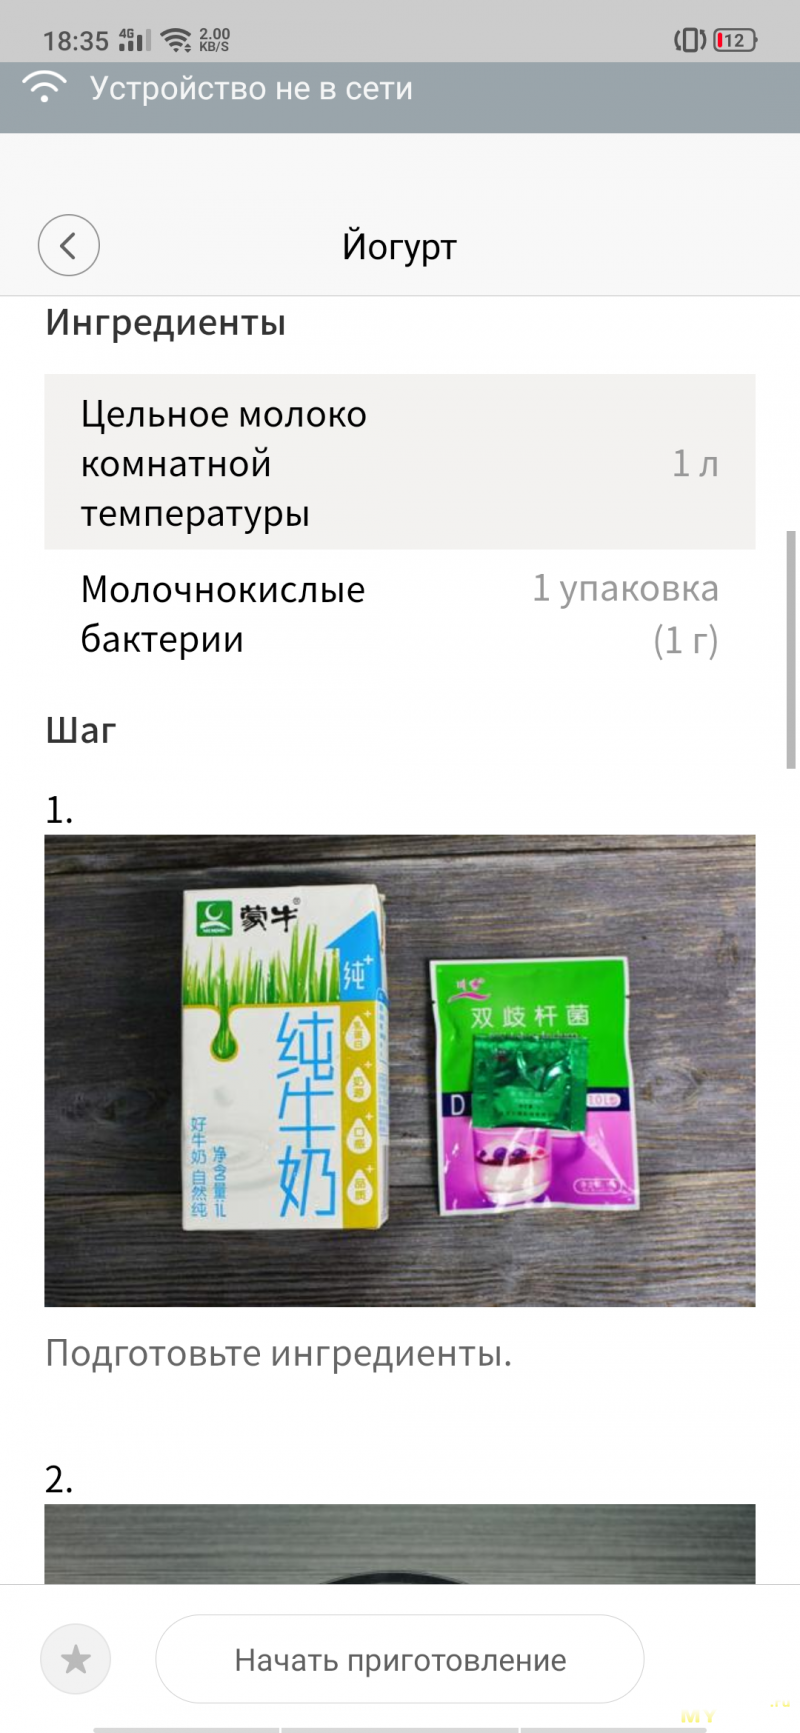 Мультиварка-рисоварка Xiaomi Mijia IH Smart Electric Rice Cooker 3L. Внеплановая готовка